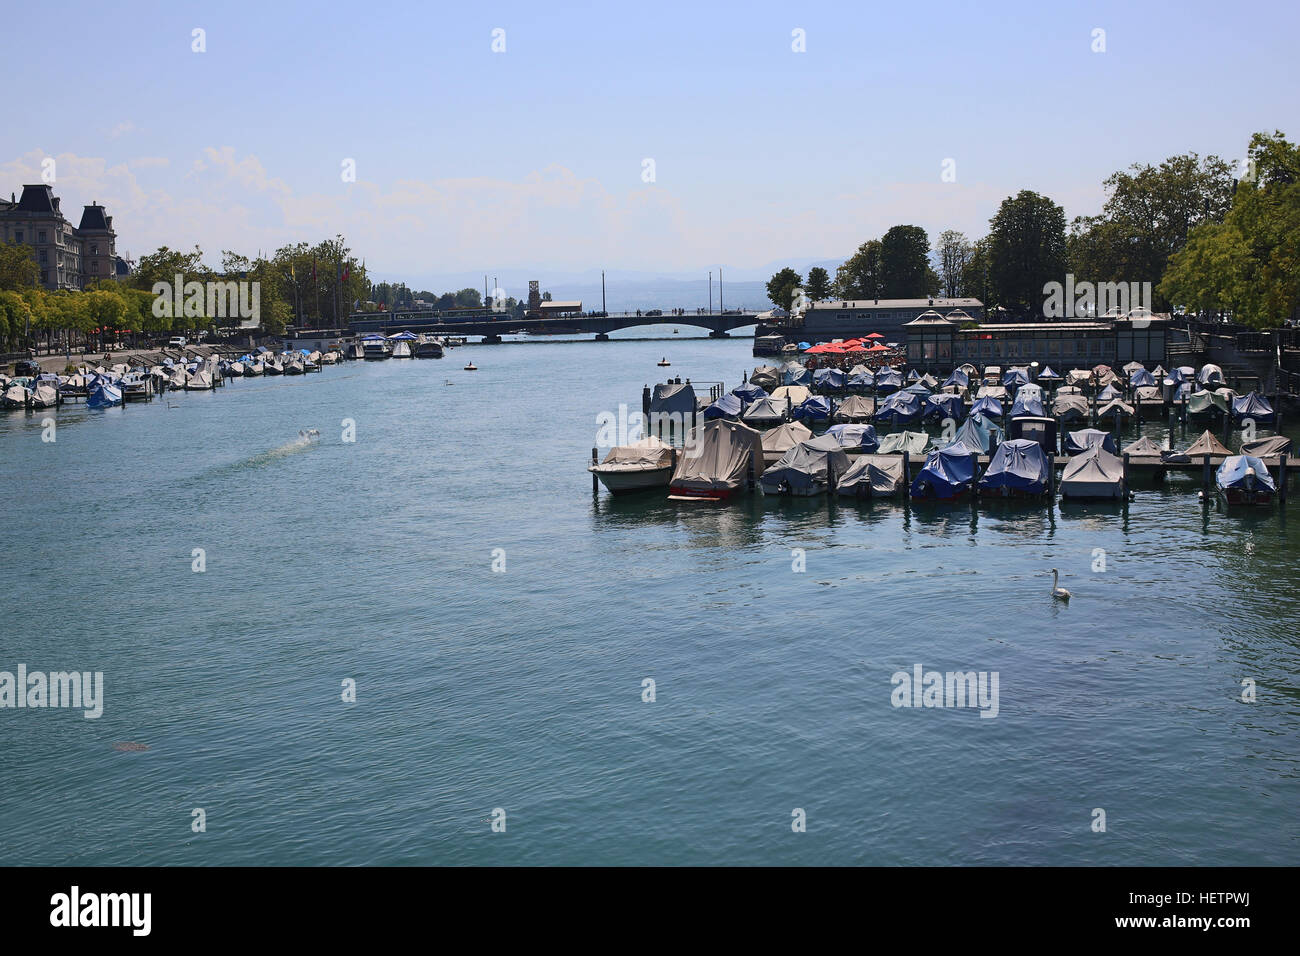 View of Zurich embankment (Limmatquai) - Stock Image